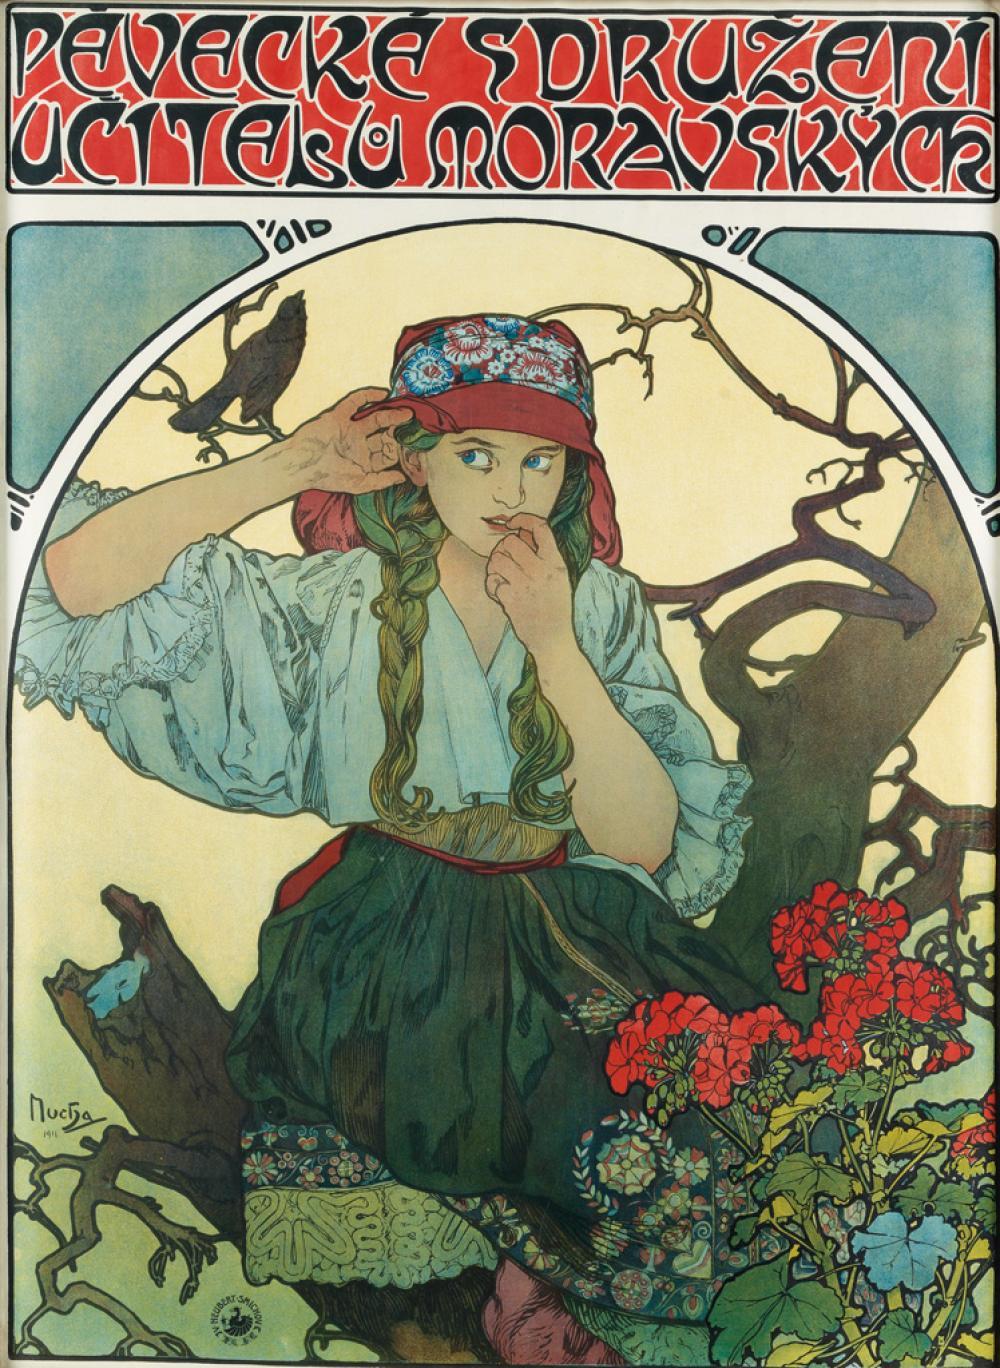 ALPHONSE MUCHA (1860-1939). PEVECKE SDRUZENI UCITELU MORAVSKYCH / [MORAVIAN TEACHER''S CHOIR.] 1911. 42x30 inches, 106x77 cm. V. Neuber